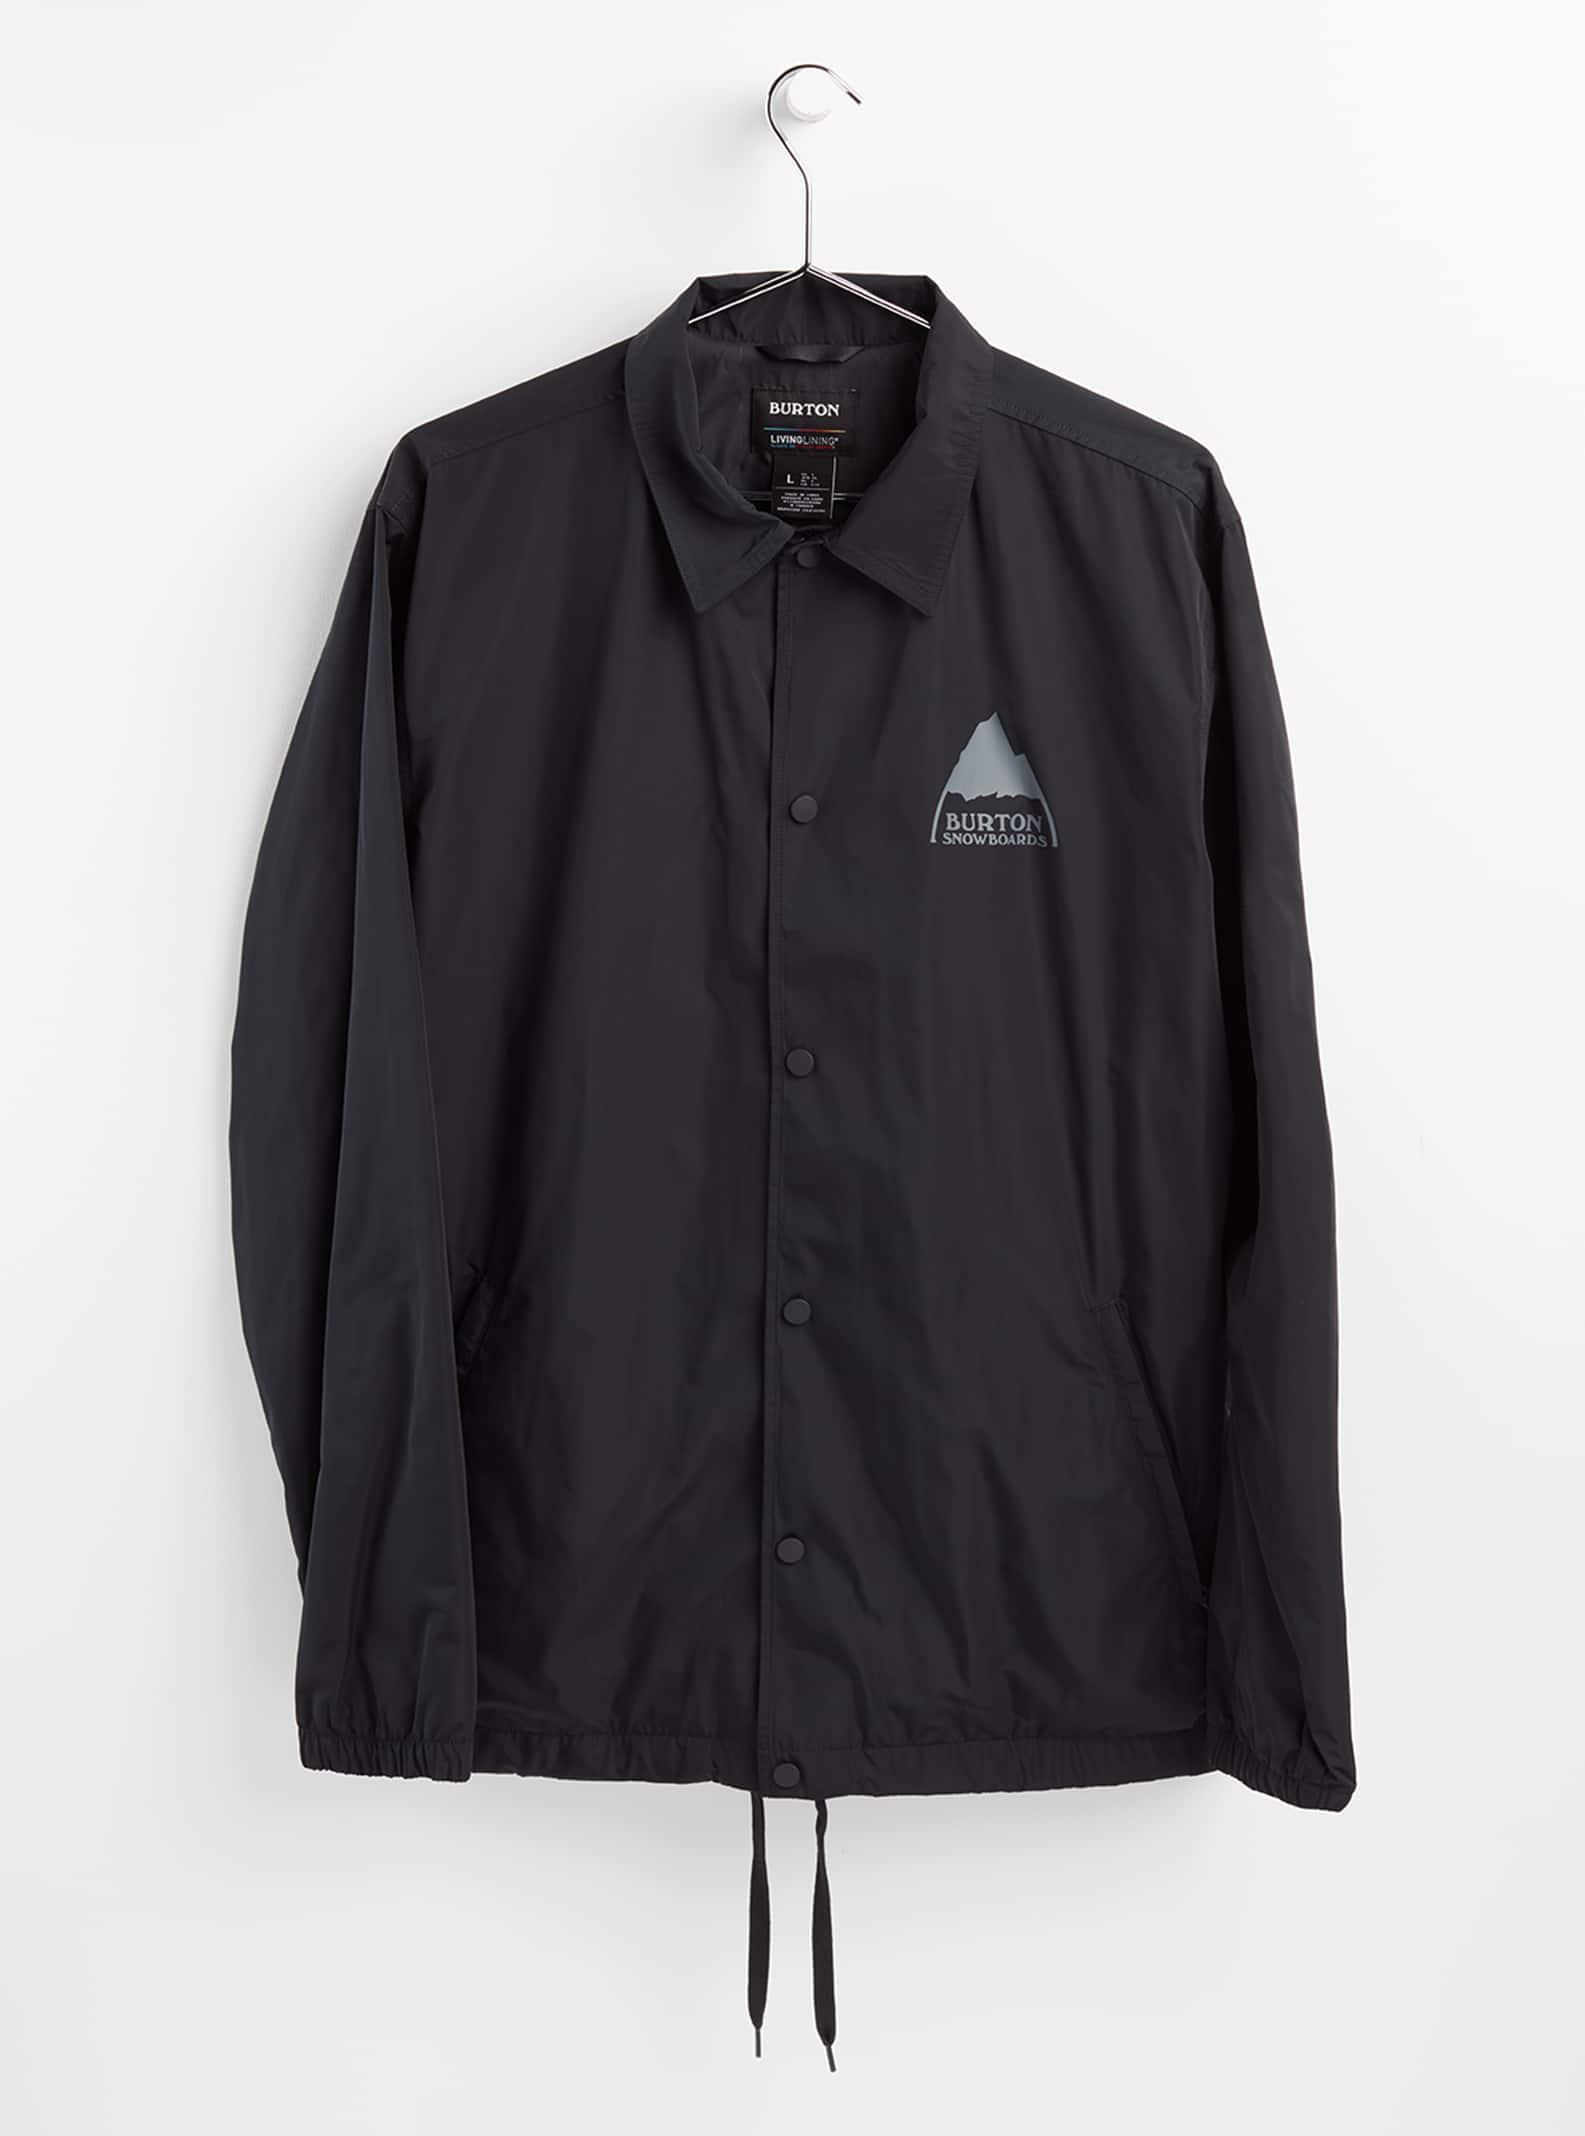 Burton Coaches-jacka för herrar, XL